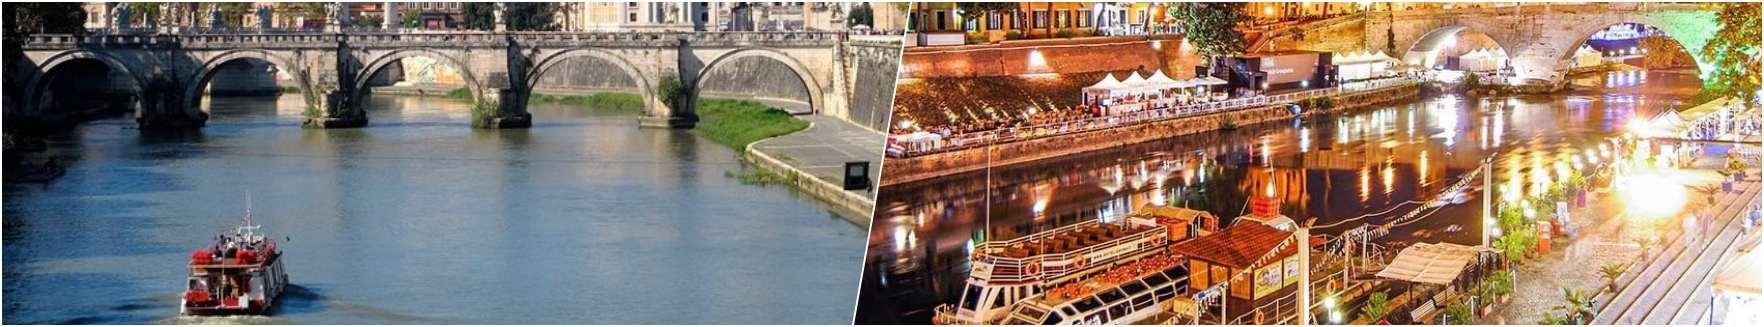 Tiber Cruise - Rome by night